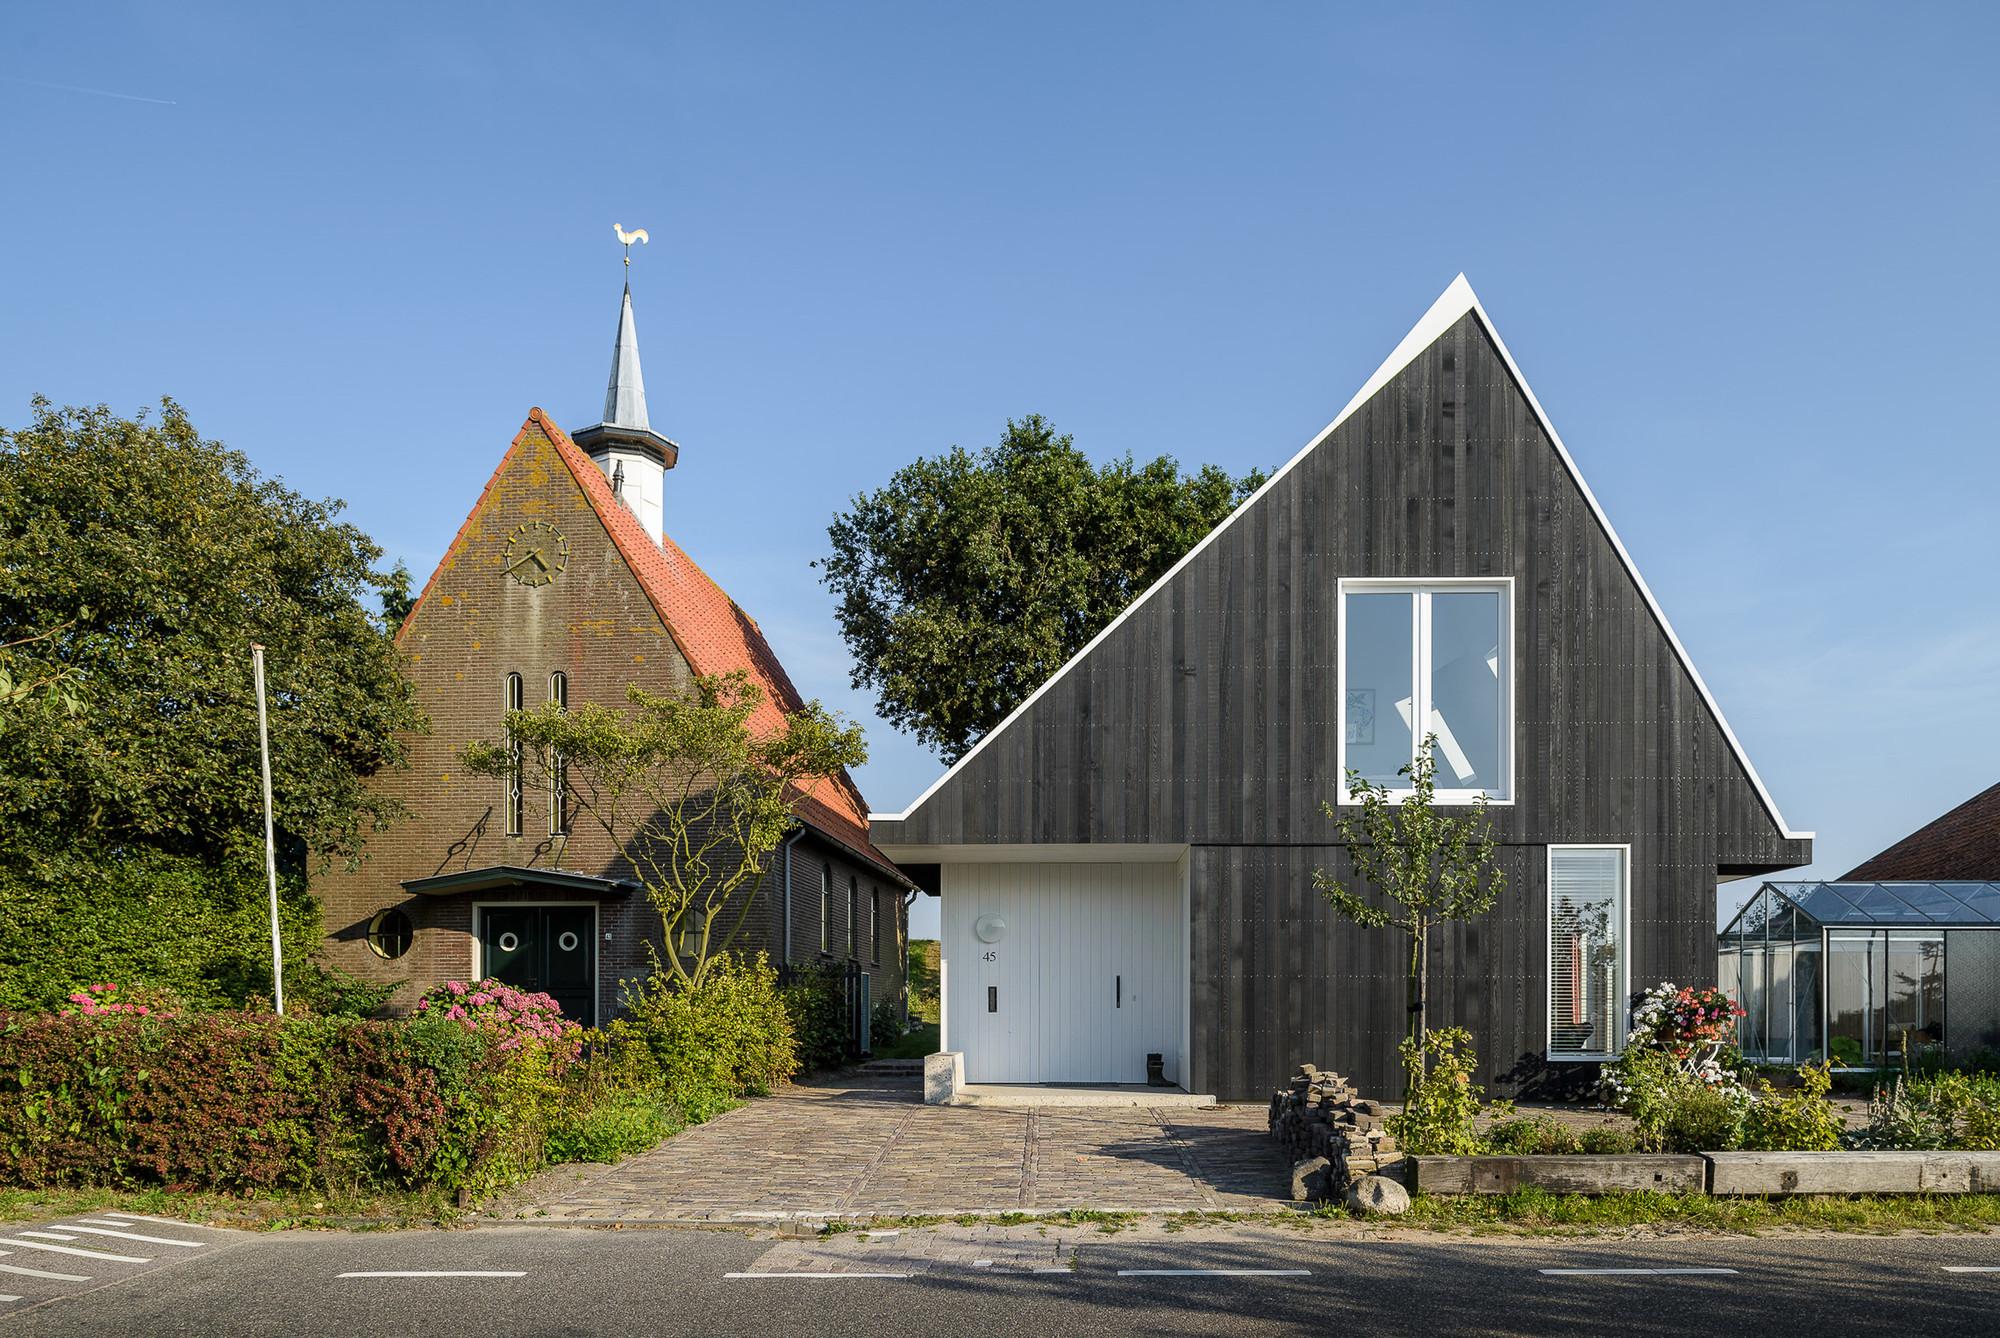 moritz bernoully photographer archdaily house in uitdam korteknie stuhlmacher architecten moritz bernoully